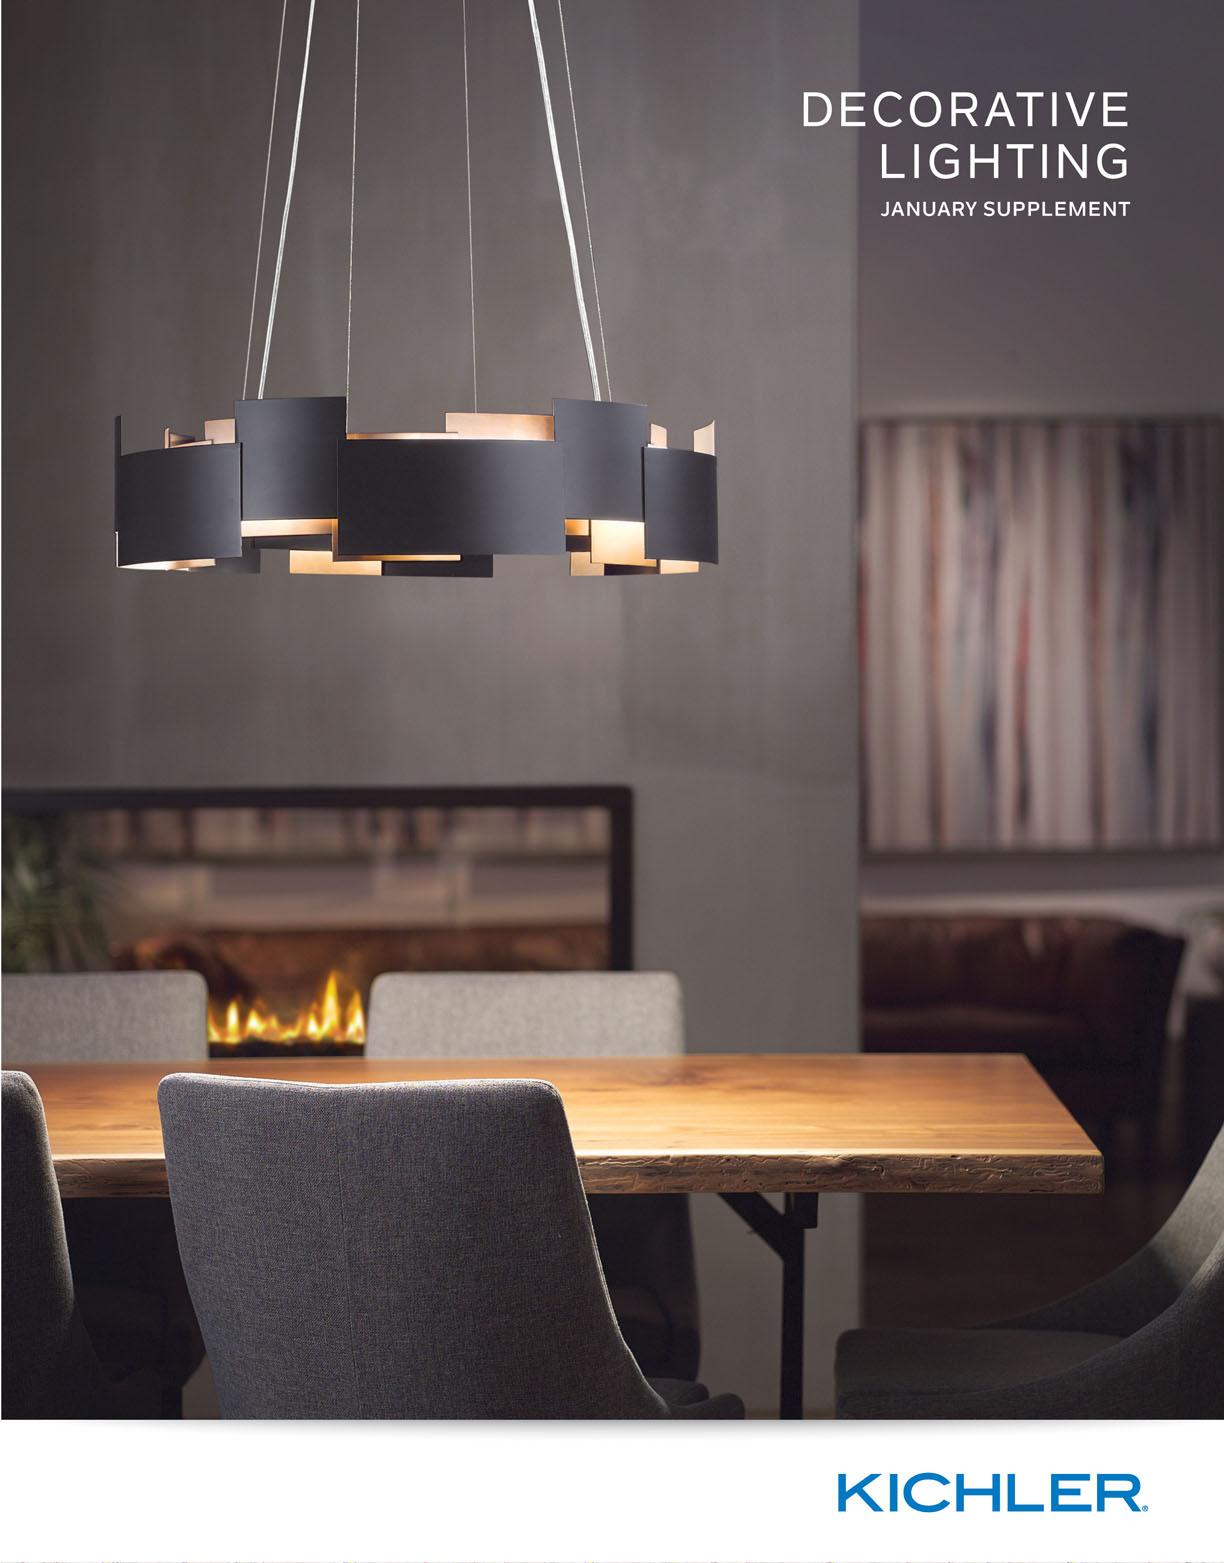 Kichler lighting 42548clp triad 3 light linear pendant classic pewter - Kichler Lighting Jan